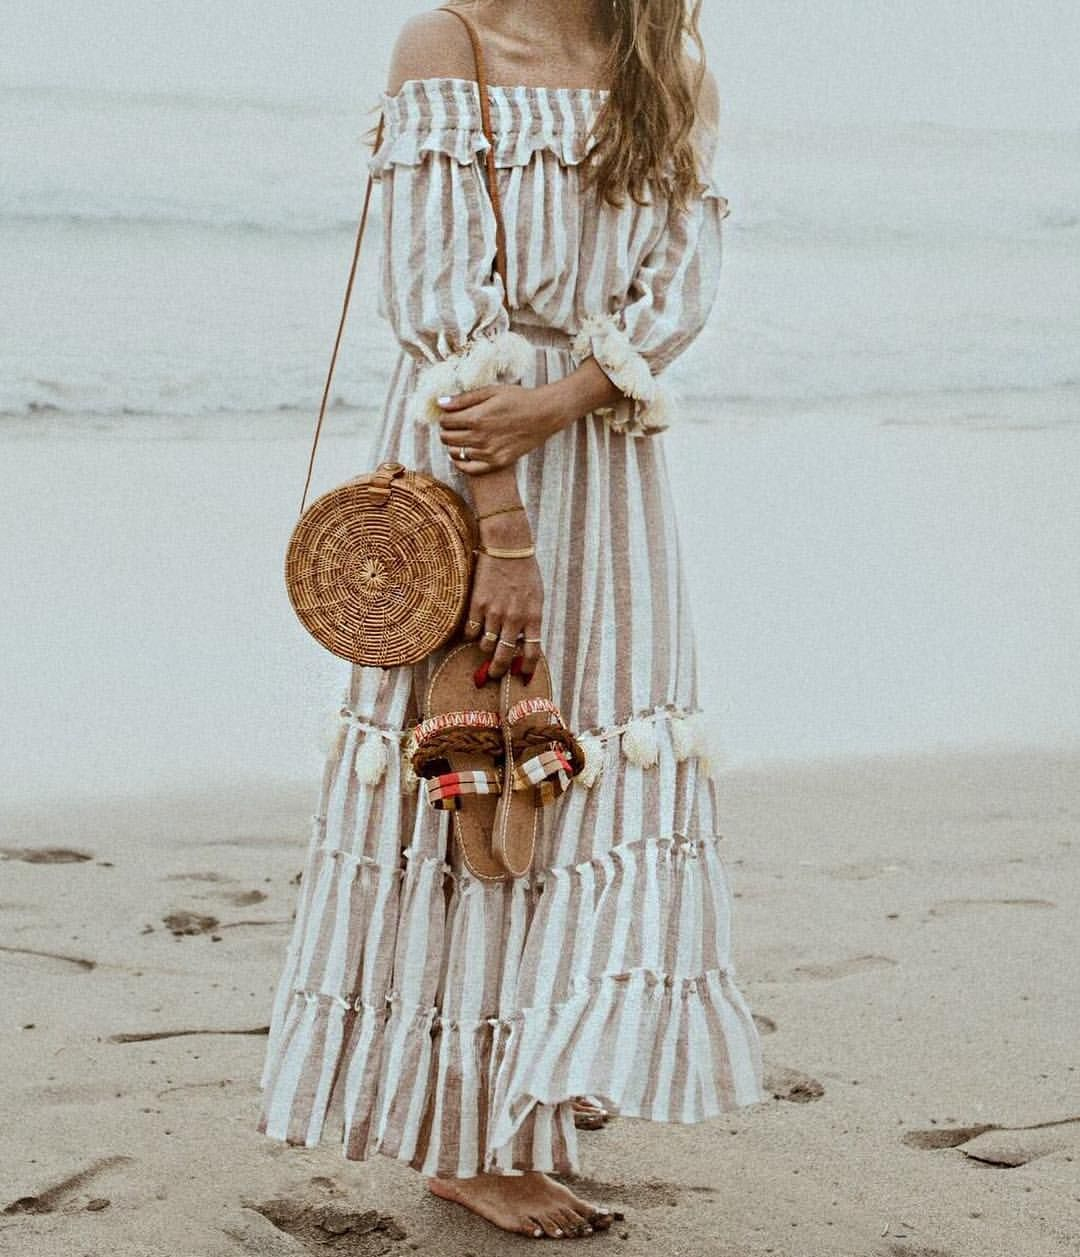 Pin by selin kurum barlas on Beach in 2020   Fringe dress